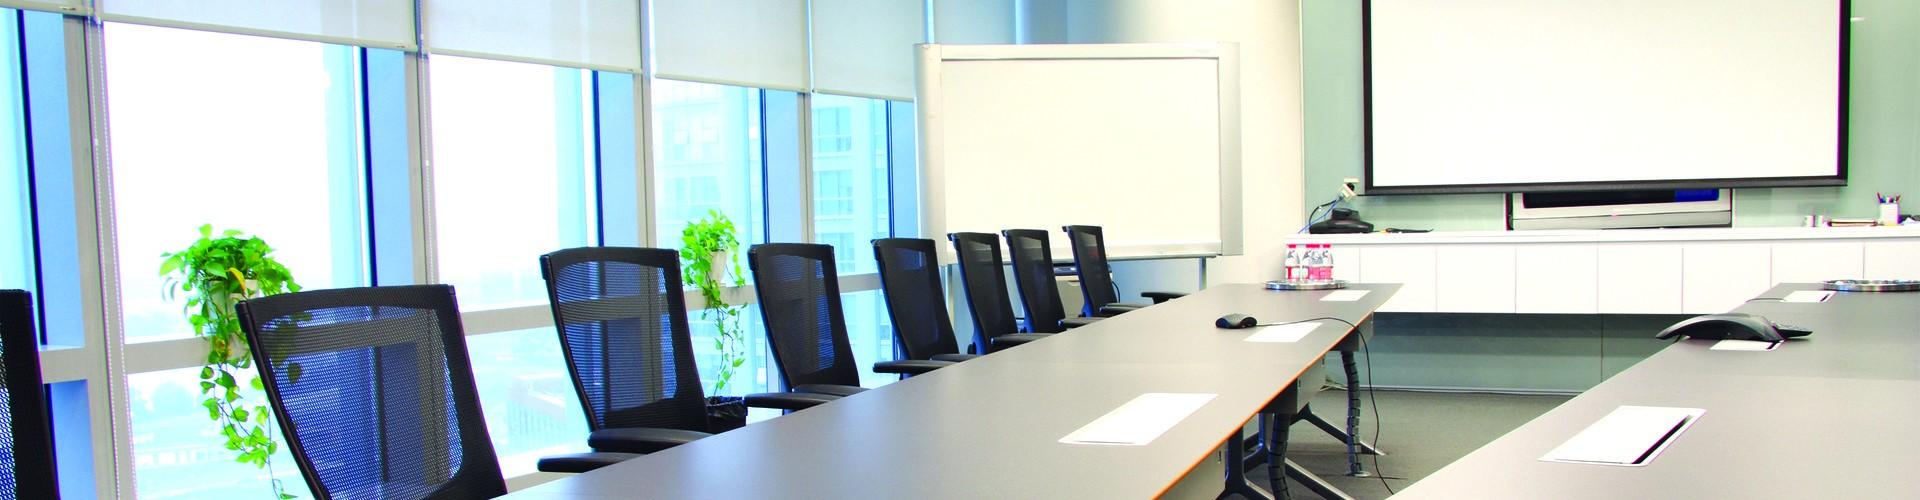 cropped-Boardroom_Table_HRez_cmyk_1920x1080.jpg